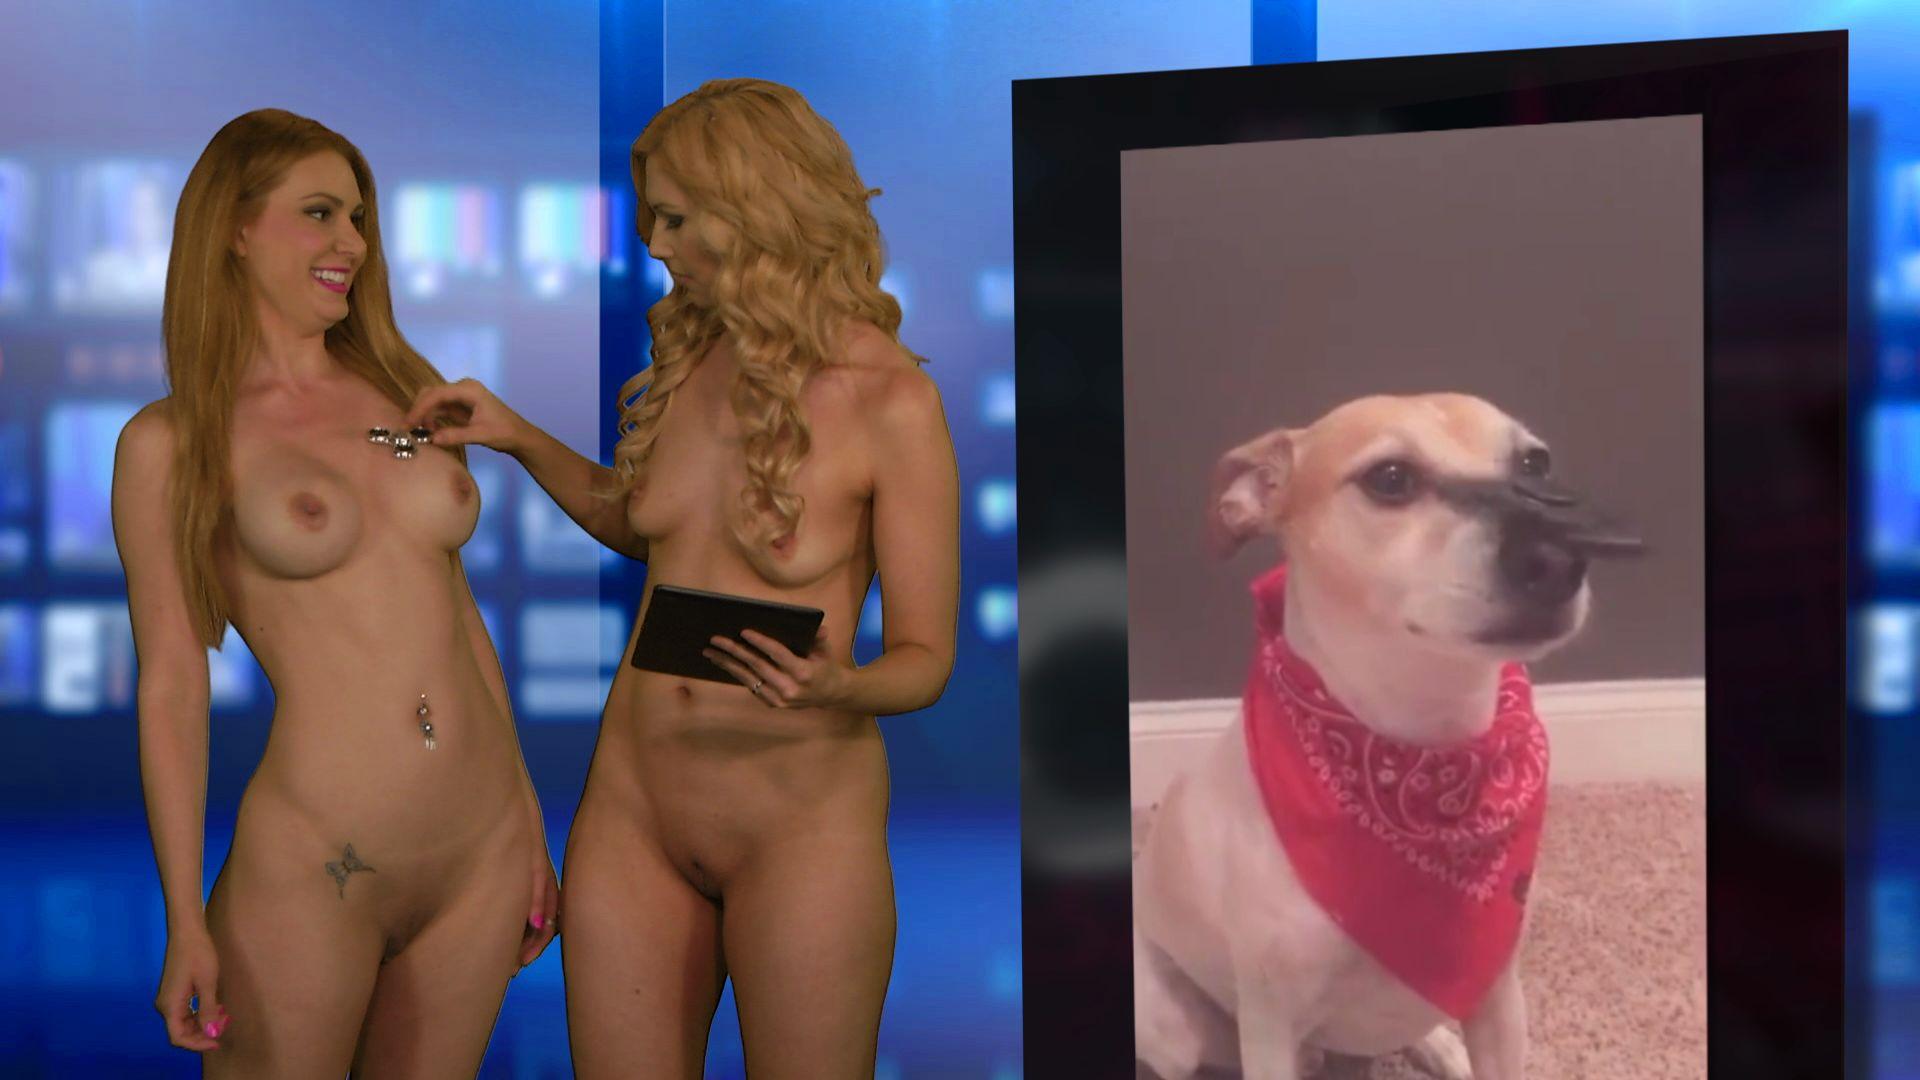 Beautiful Nudes, Hot Naked Females, Naked News, Nude Weather Girls 0002